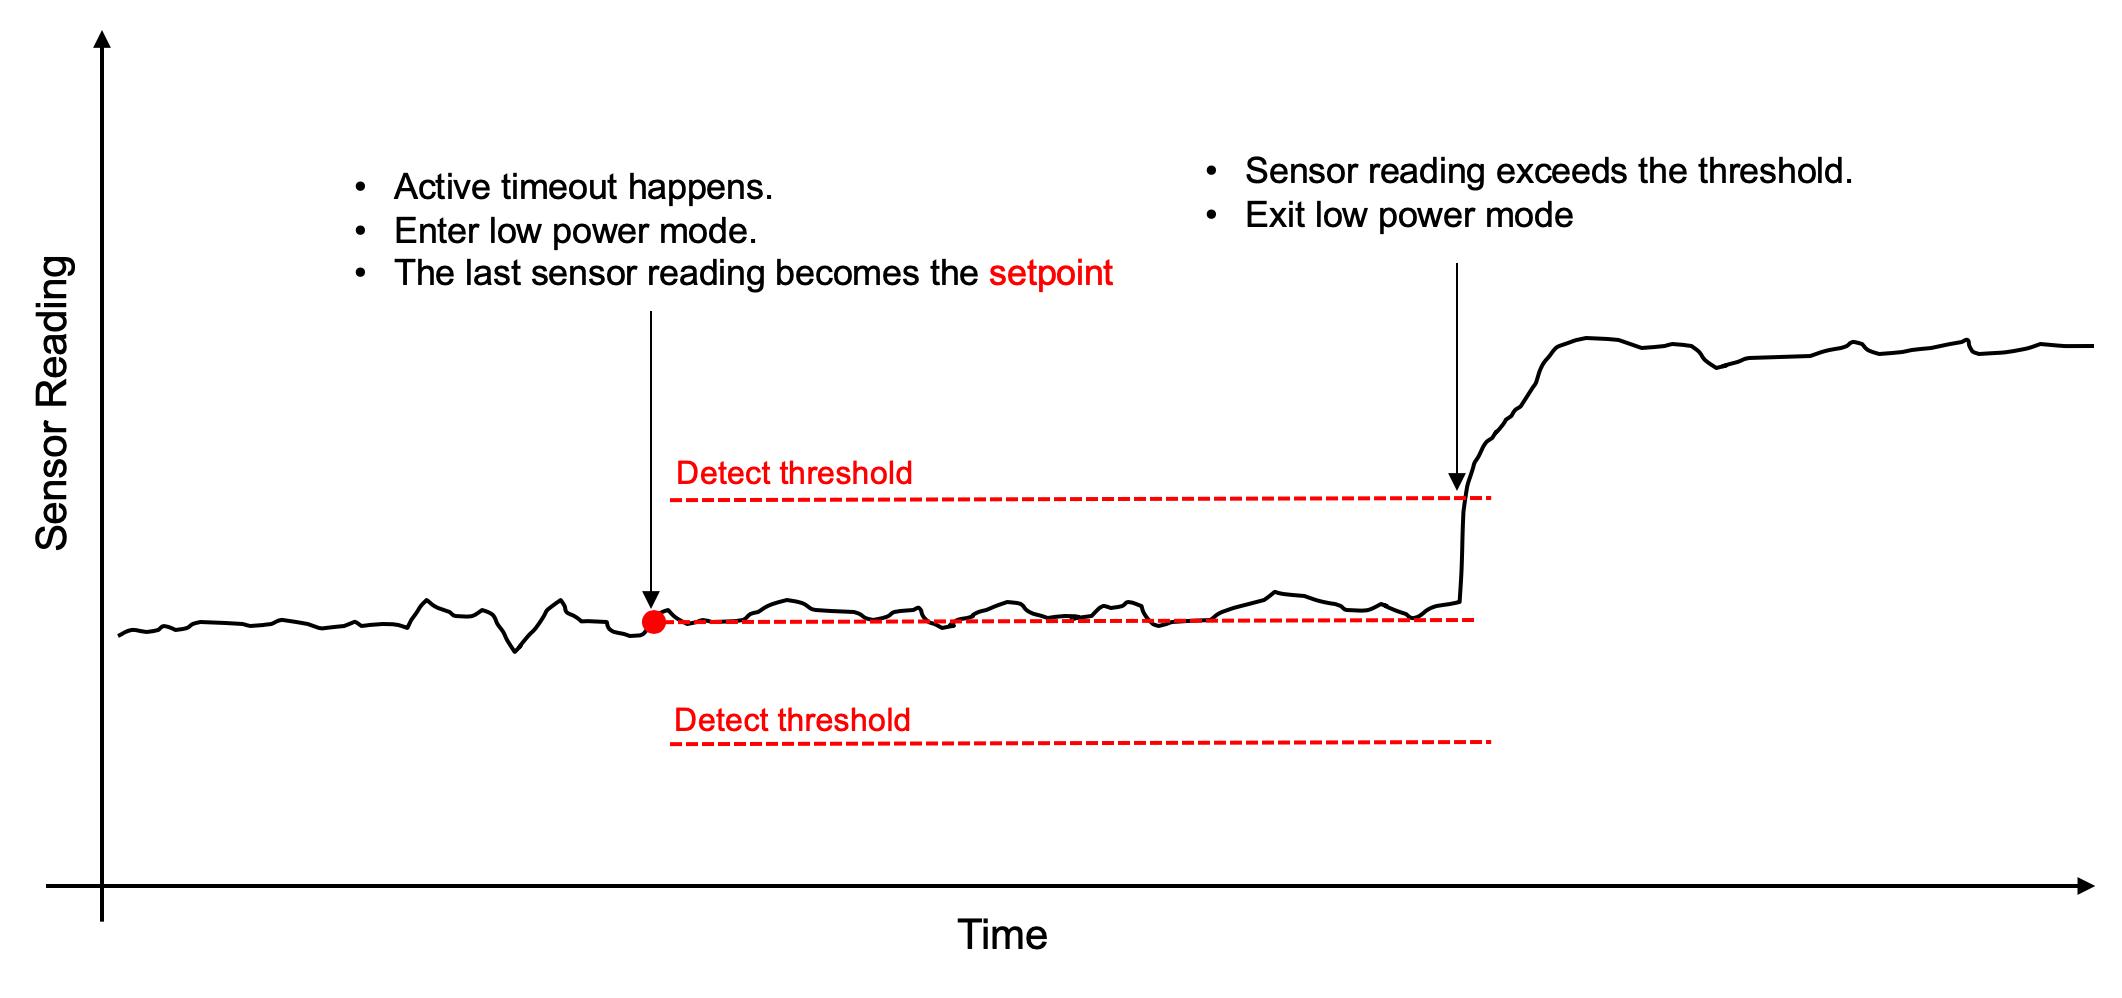 SensorReading.png